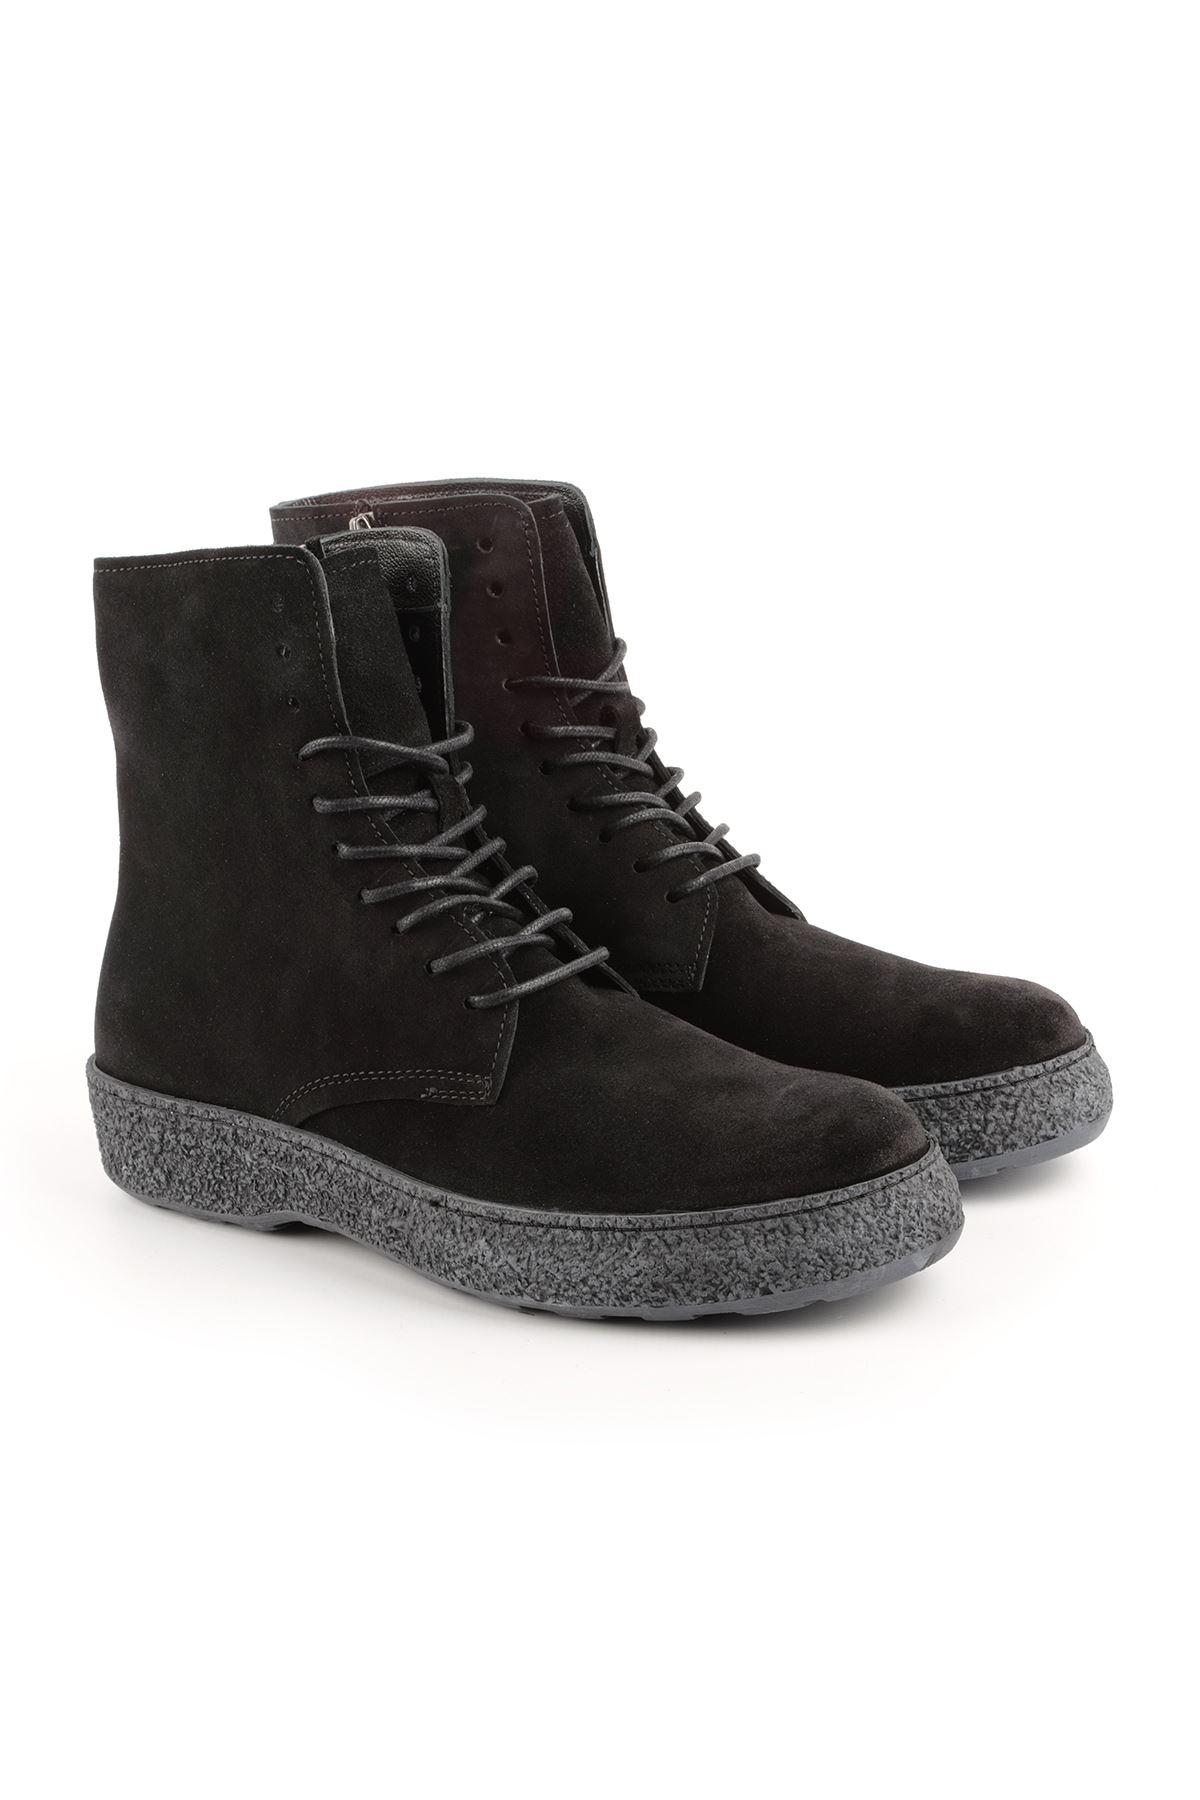 Libero L3448 Black Suede Boots